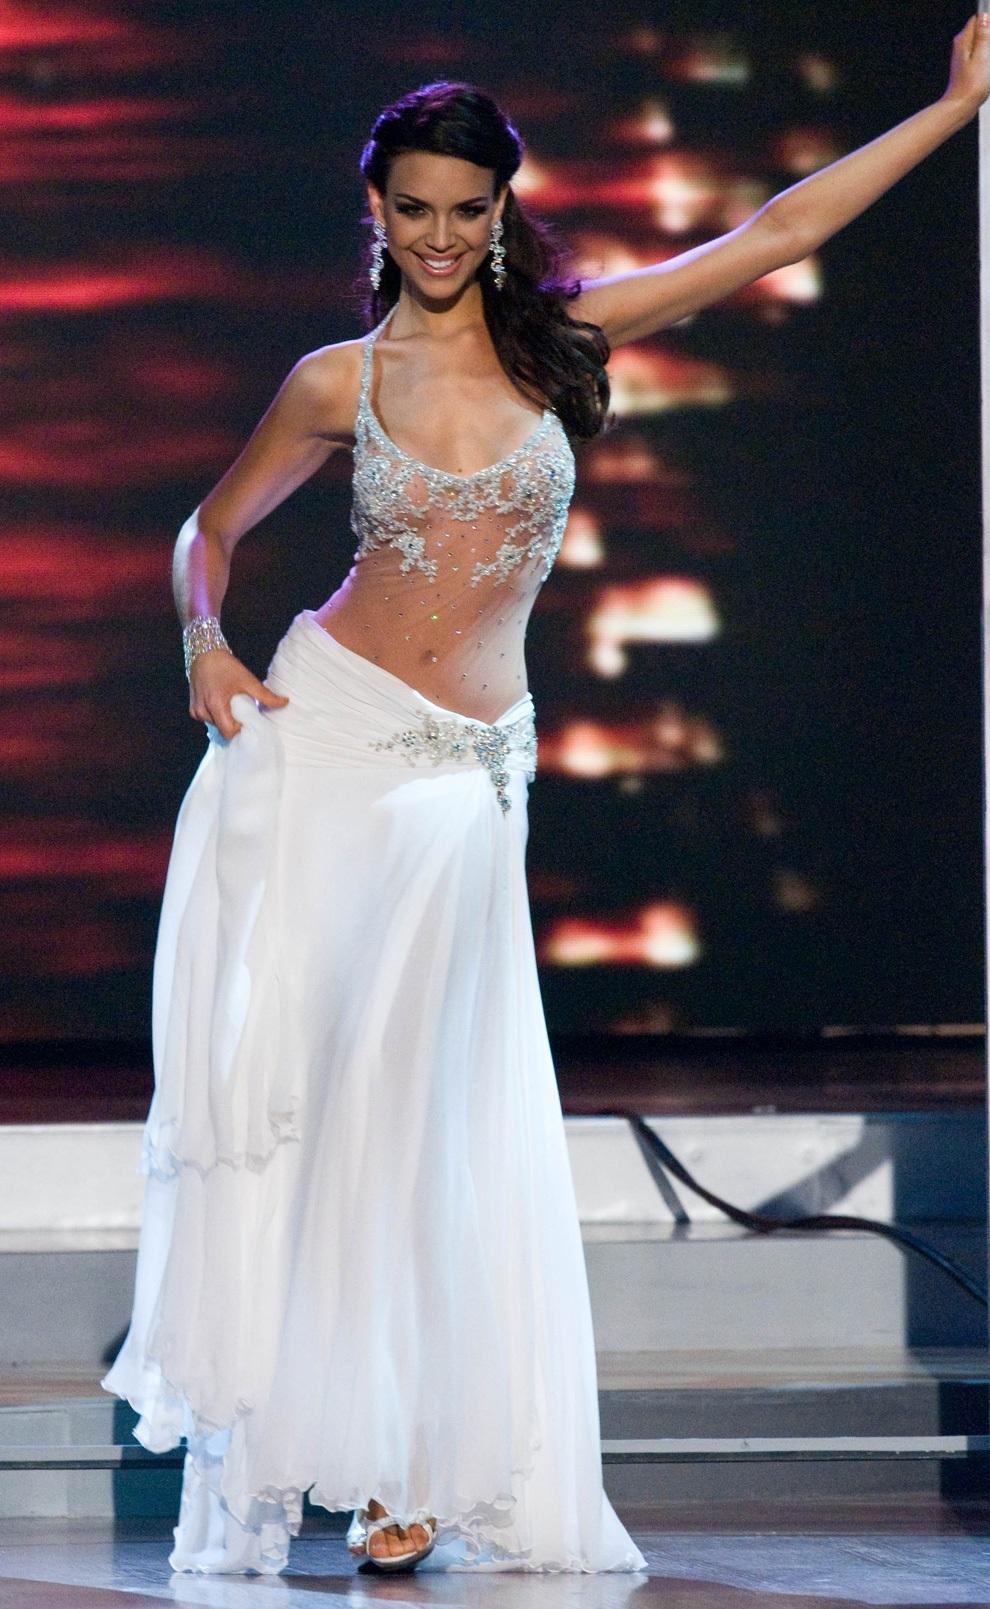 elisa najera, top 5 de miss universe 2008. Pcj3szhb